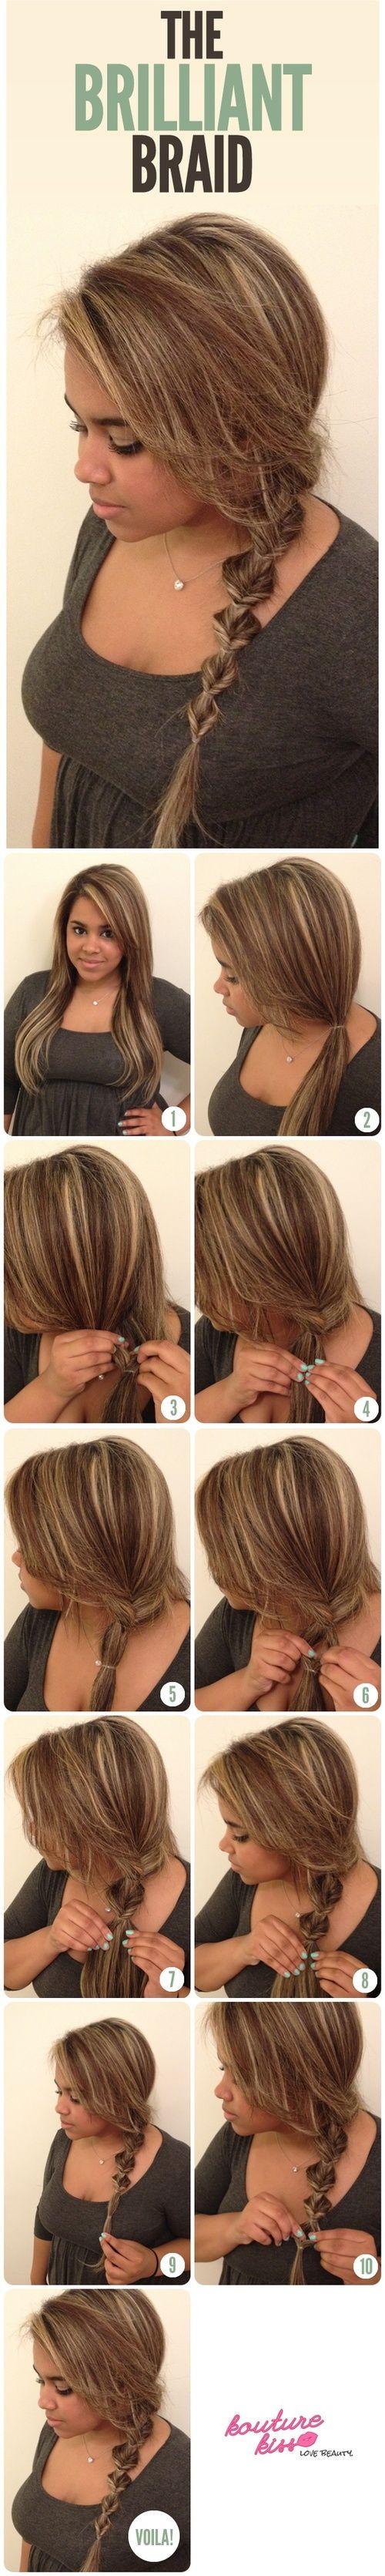 DIY - The Brilliant Braid Tutorial